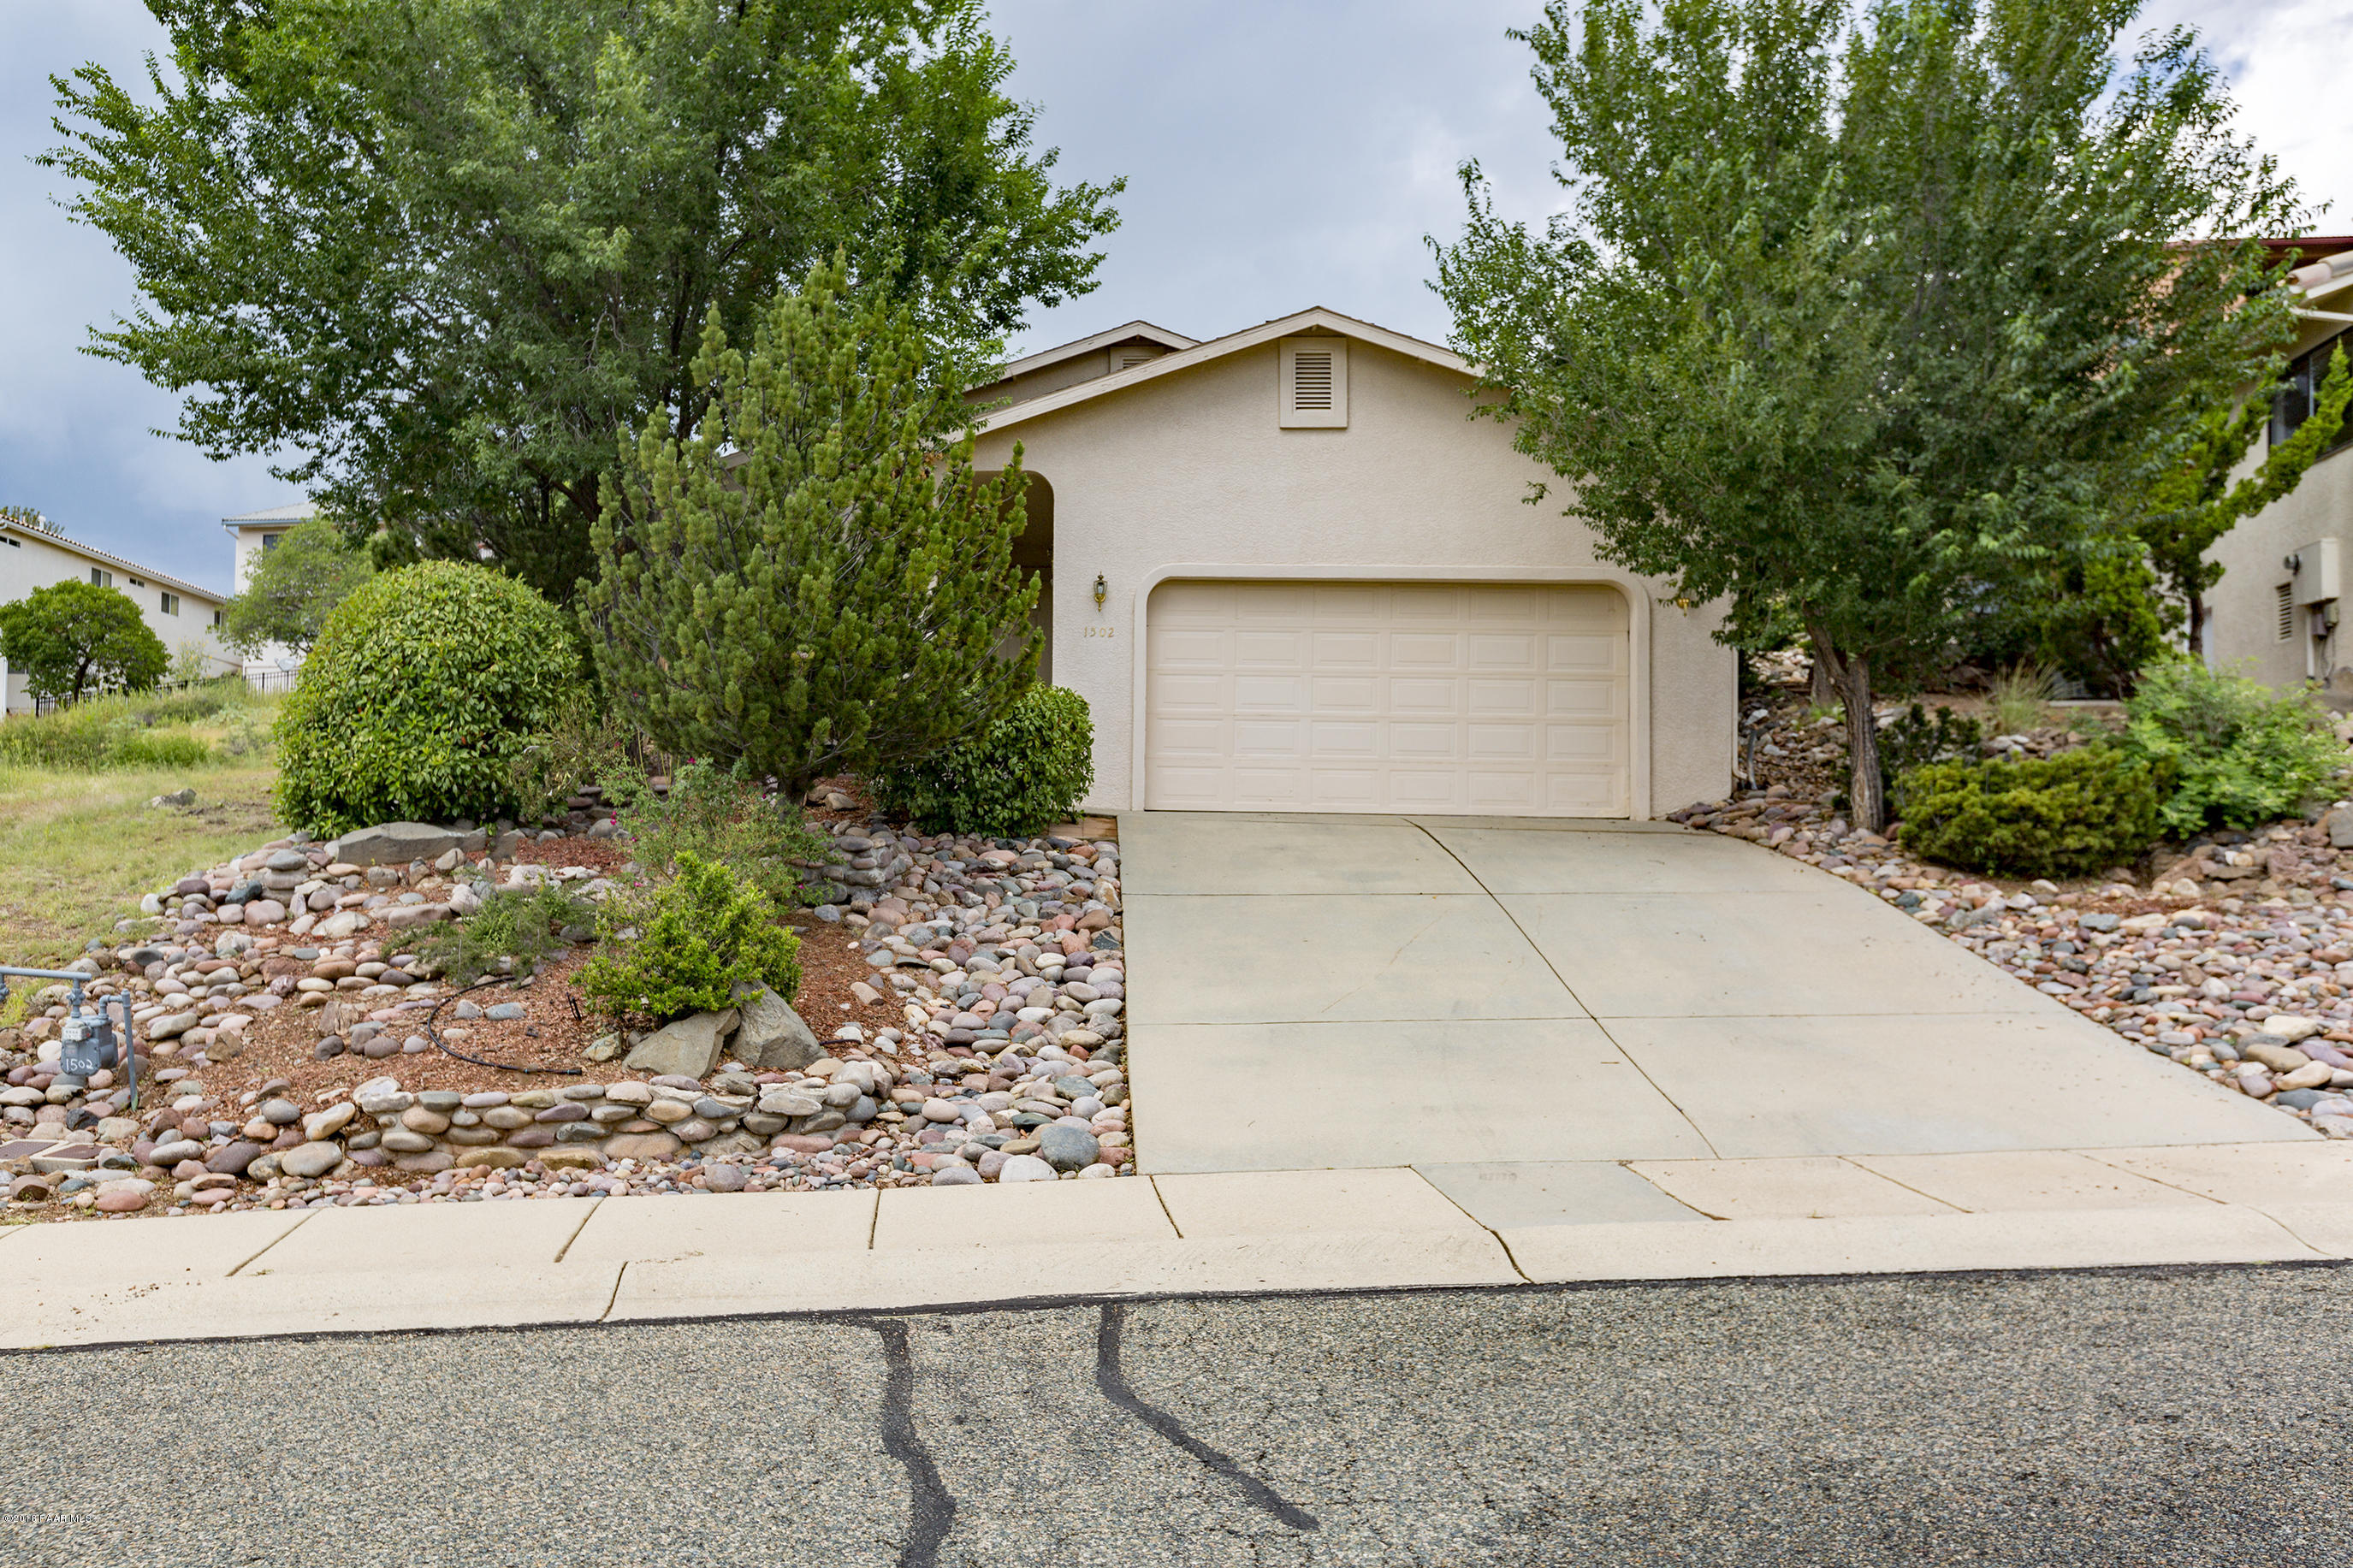 Photo of 1502 Marvin Gardens, Prescott, AZ 86301